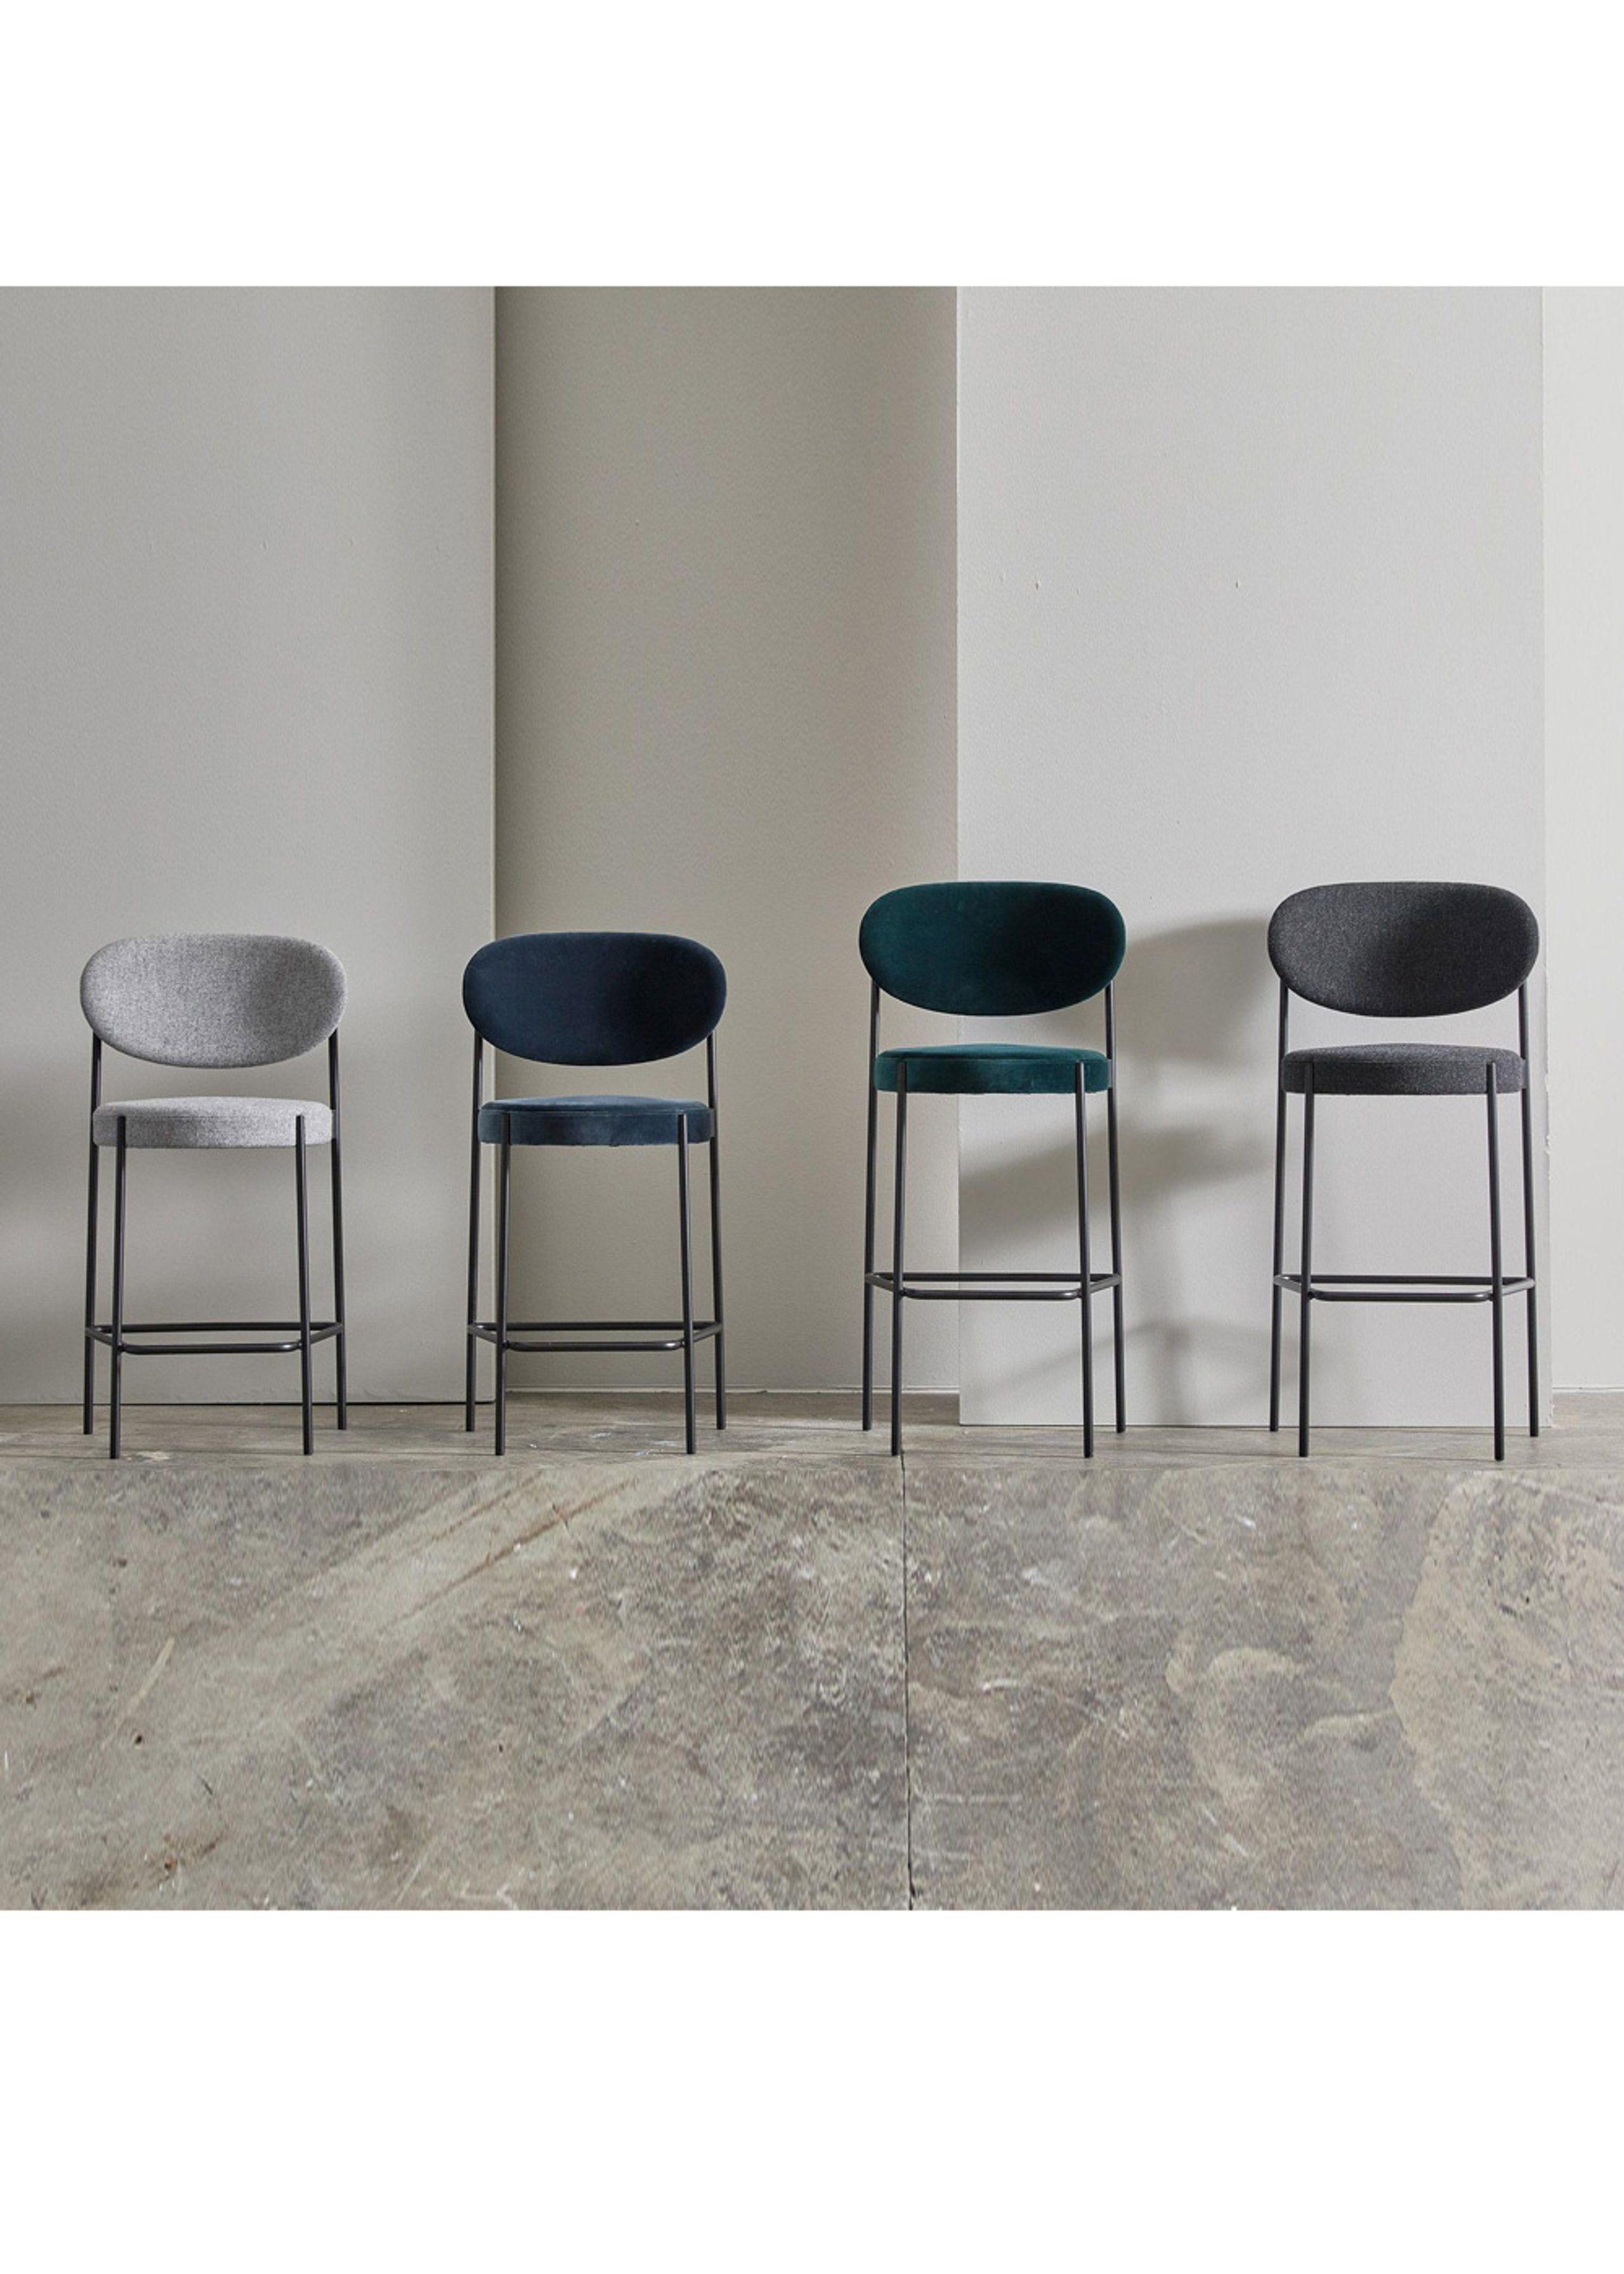 Ikea Verner Bureaustoel.Verner 430 Bar Panton Verpan Stoel Stool By Cxtsqrdh